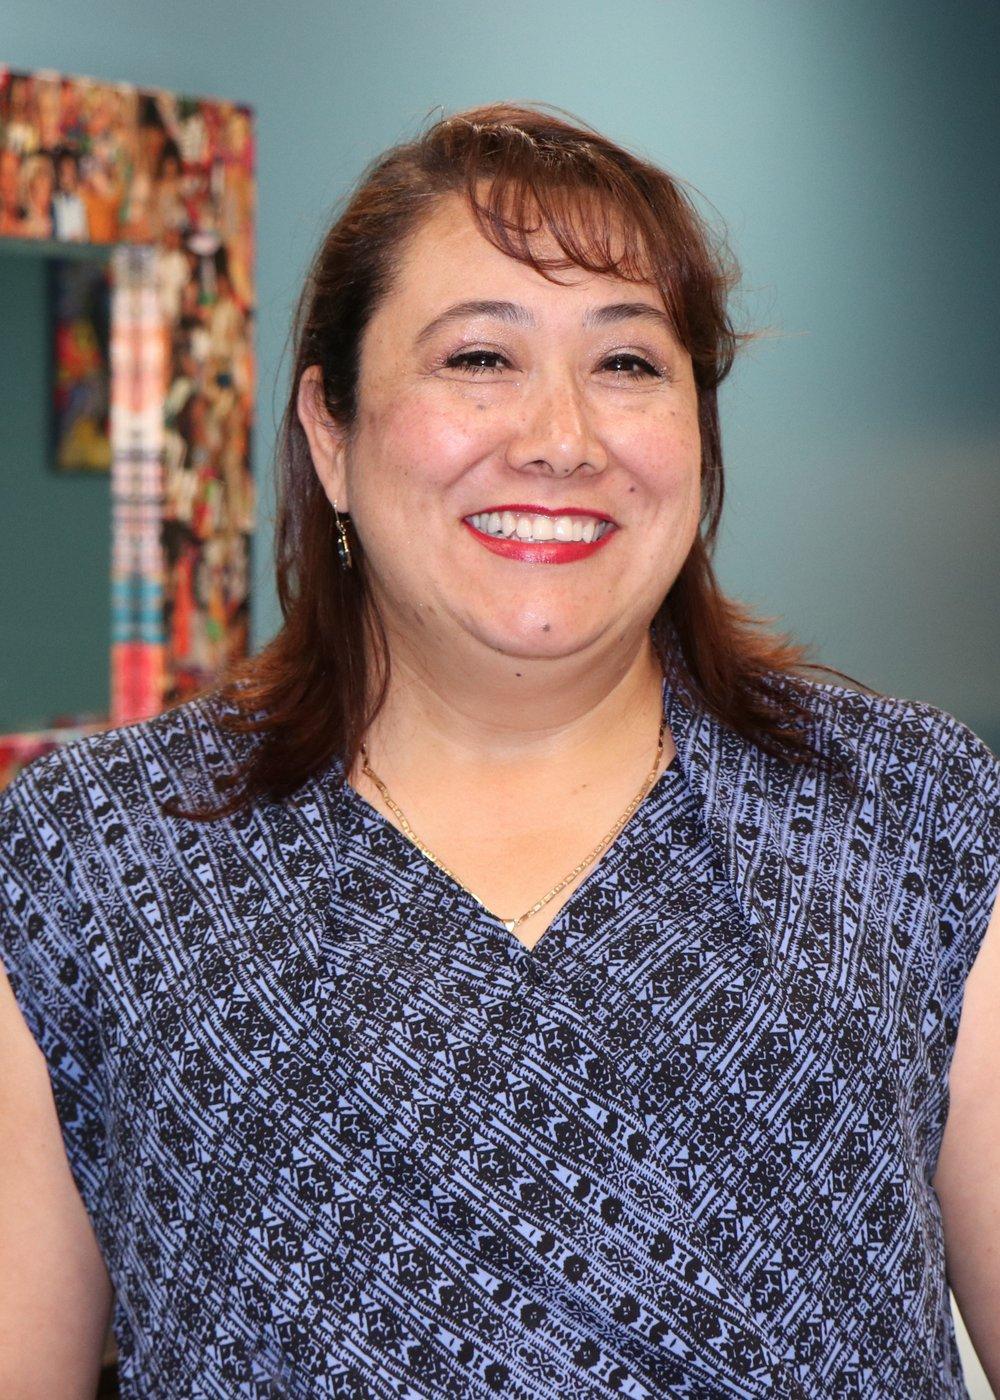 BILINGUAL ORGANIZER - Maria Robles